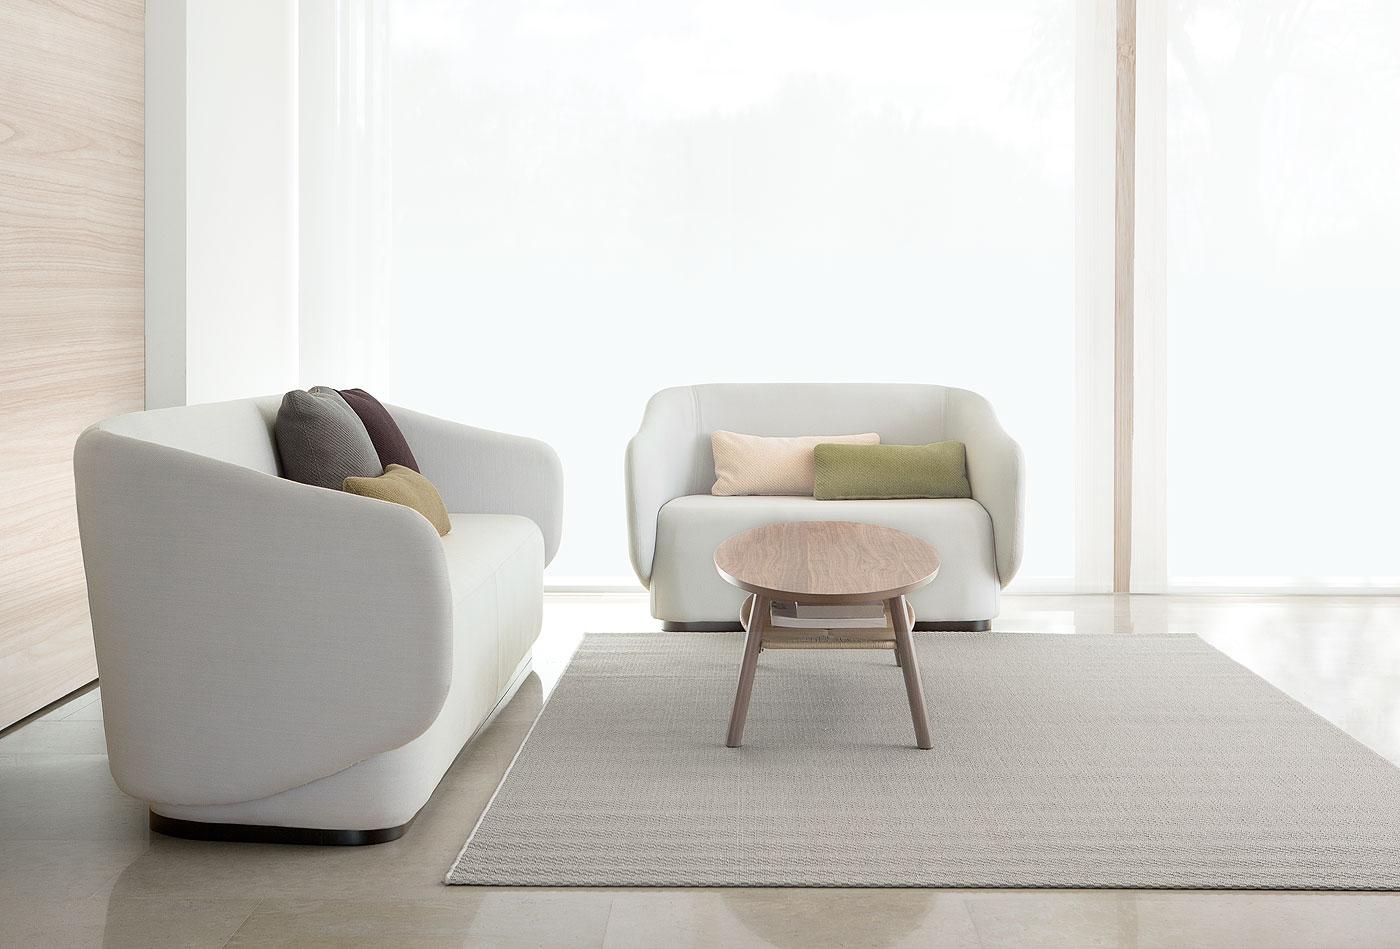 sofa-yon-pau-design-lavernia-cienfuegos (3)